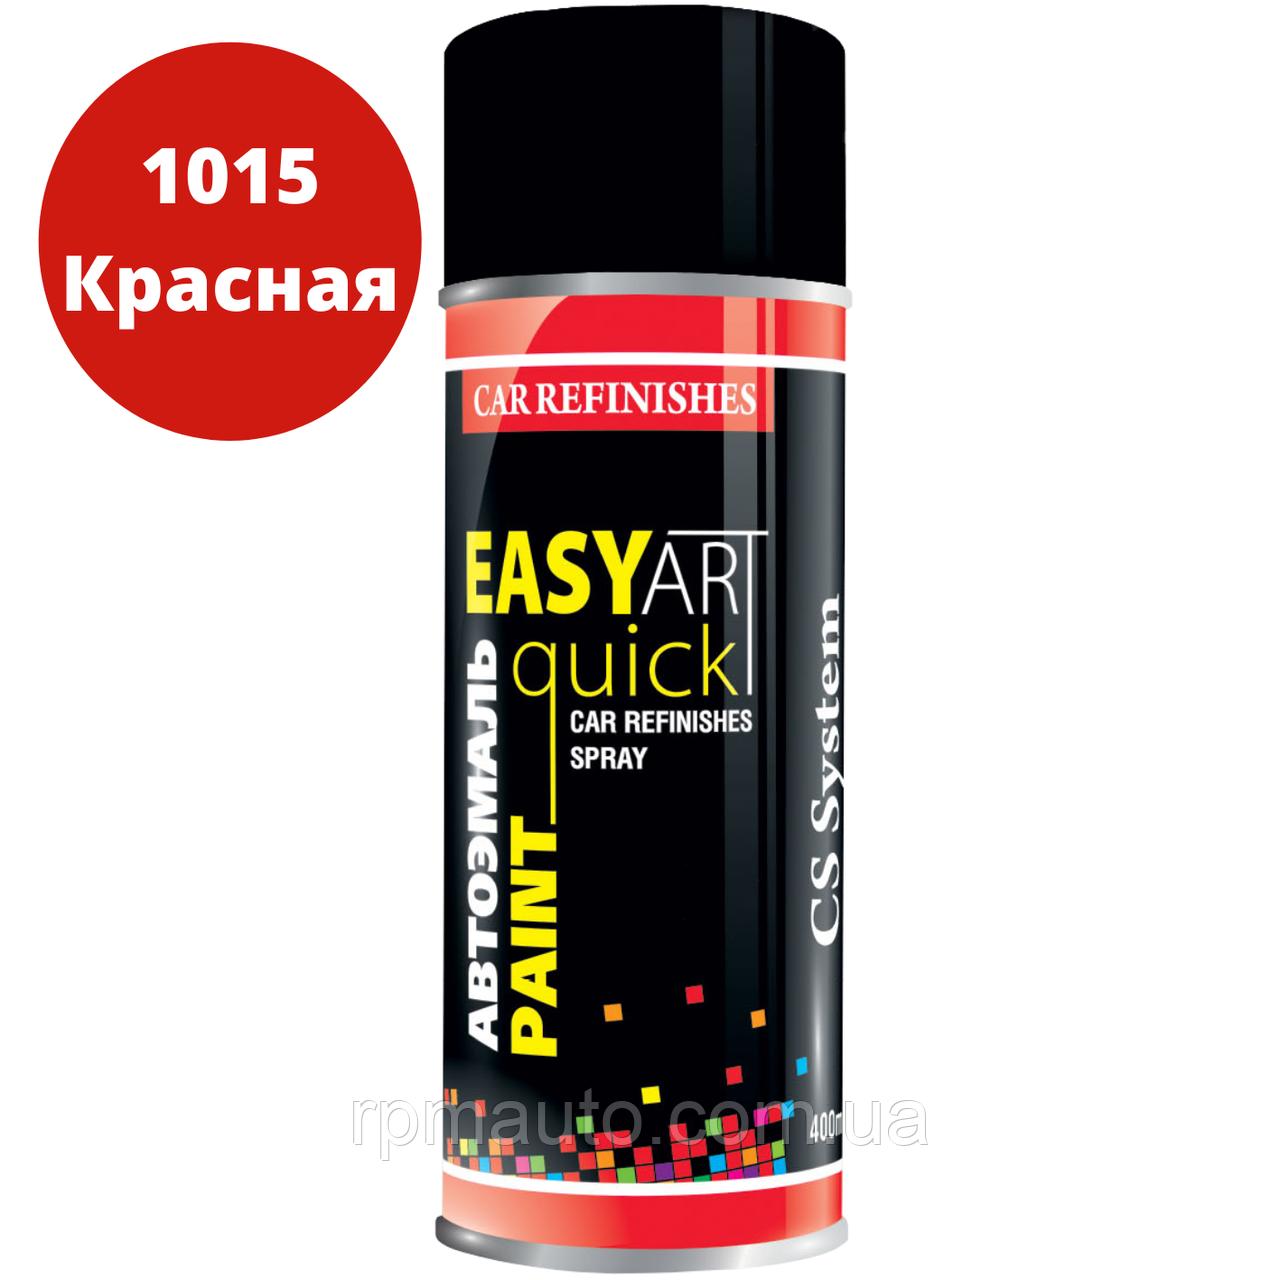 Автомобільна Фарба в Балончиках Червоний 1015 CSS EASY ART Quick 400мл Аерозольна Акрилова